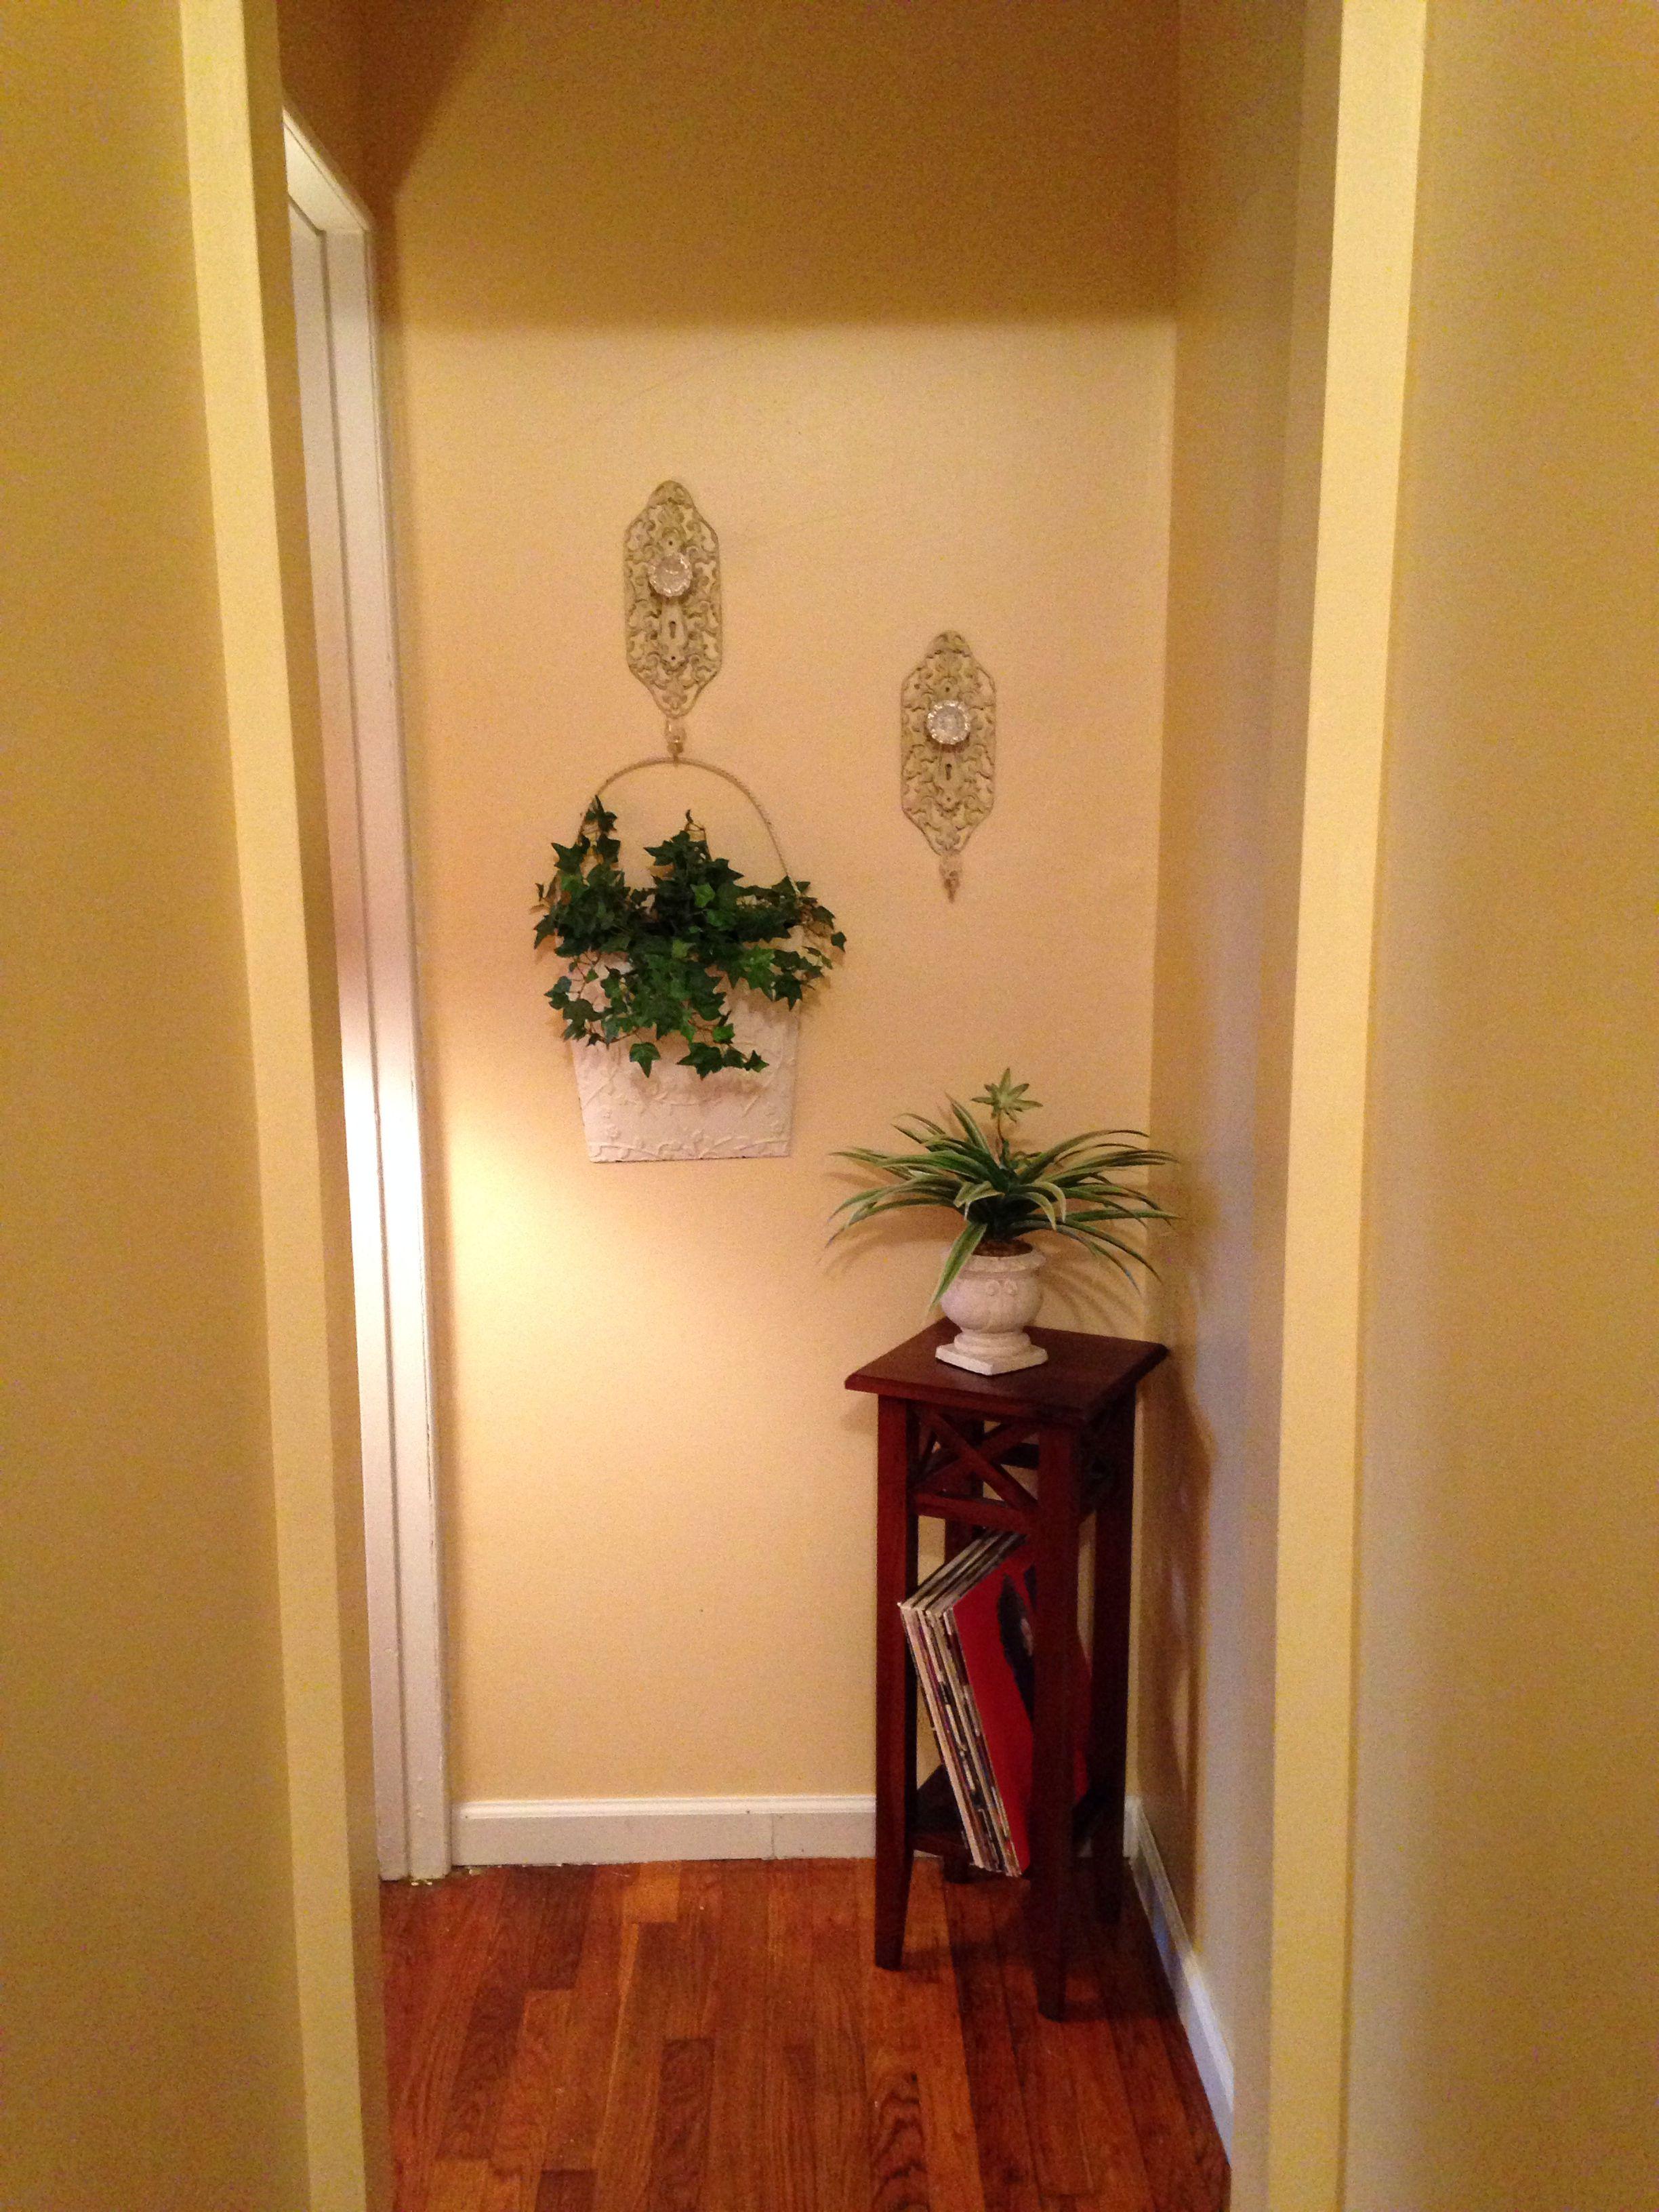 End Of Hallway Decor Via Meghann Tinker